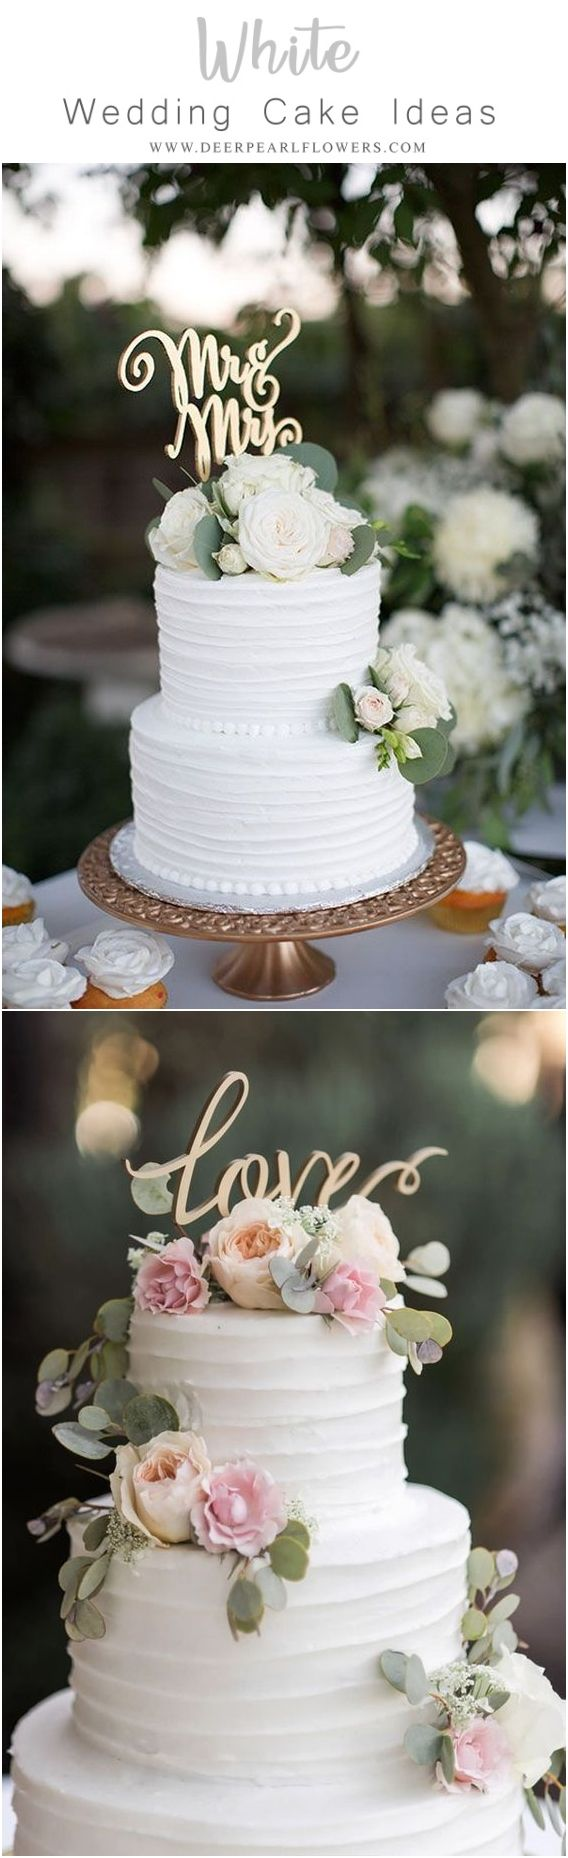 Wedding Quotes : Elegant white wedding cake ideas - wedding ...